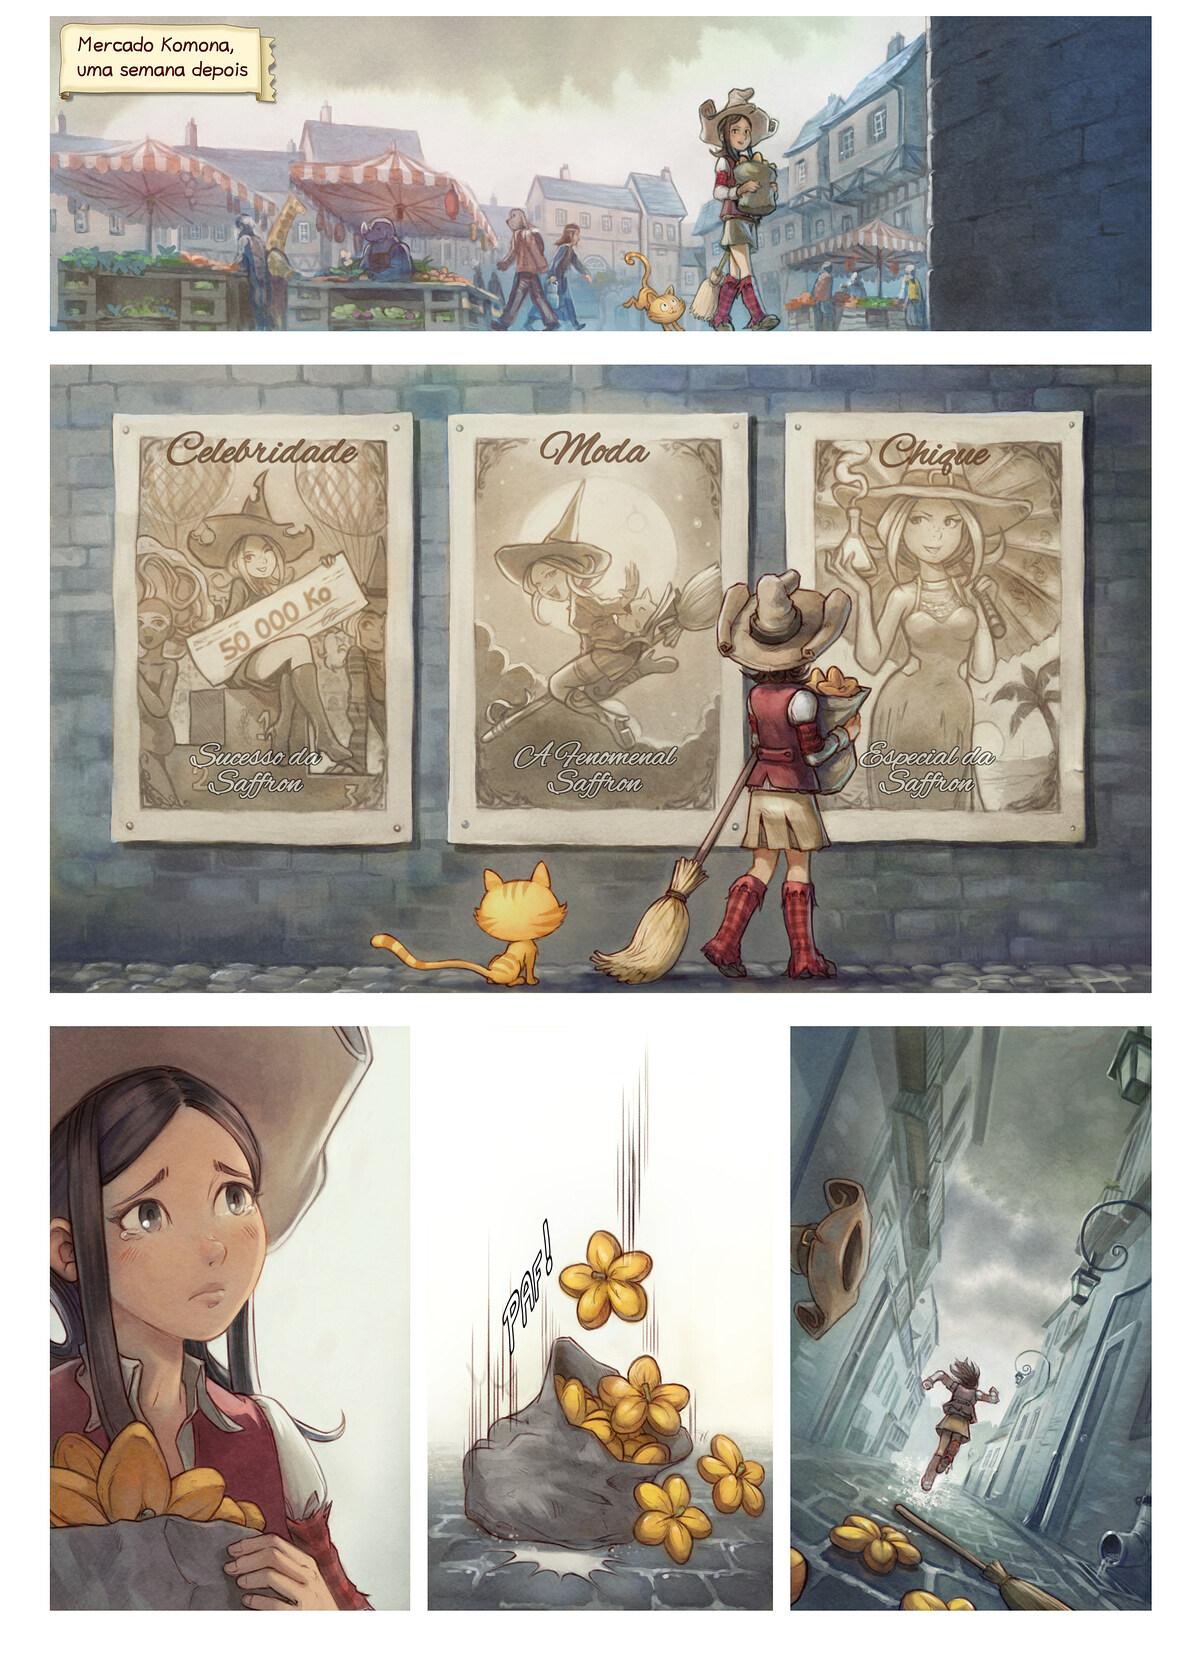 A webcomic page of Pepper&Carrot, episódio 23 [pt], página 1